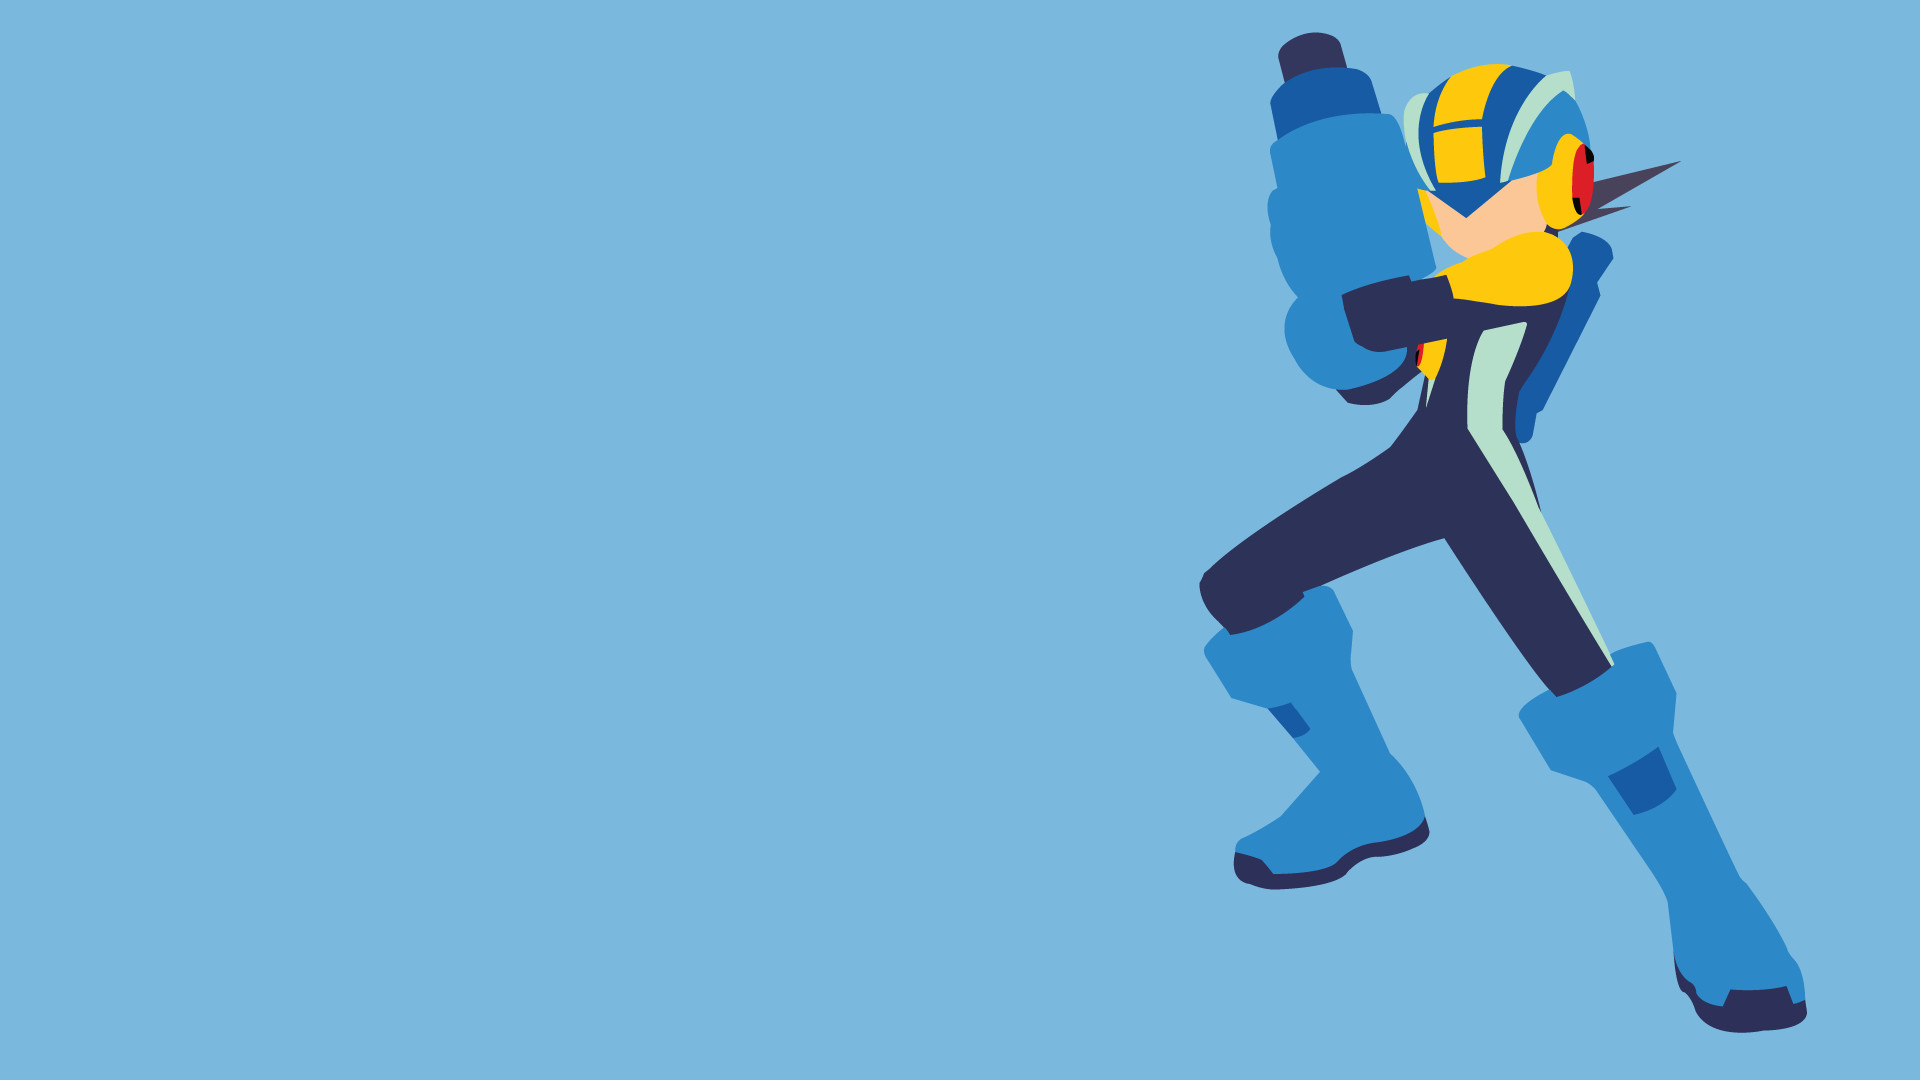 … Mega Man Battle Network – MegaMan.exe Wallpaper by LimeCatMastr